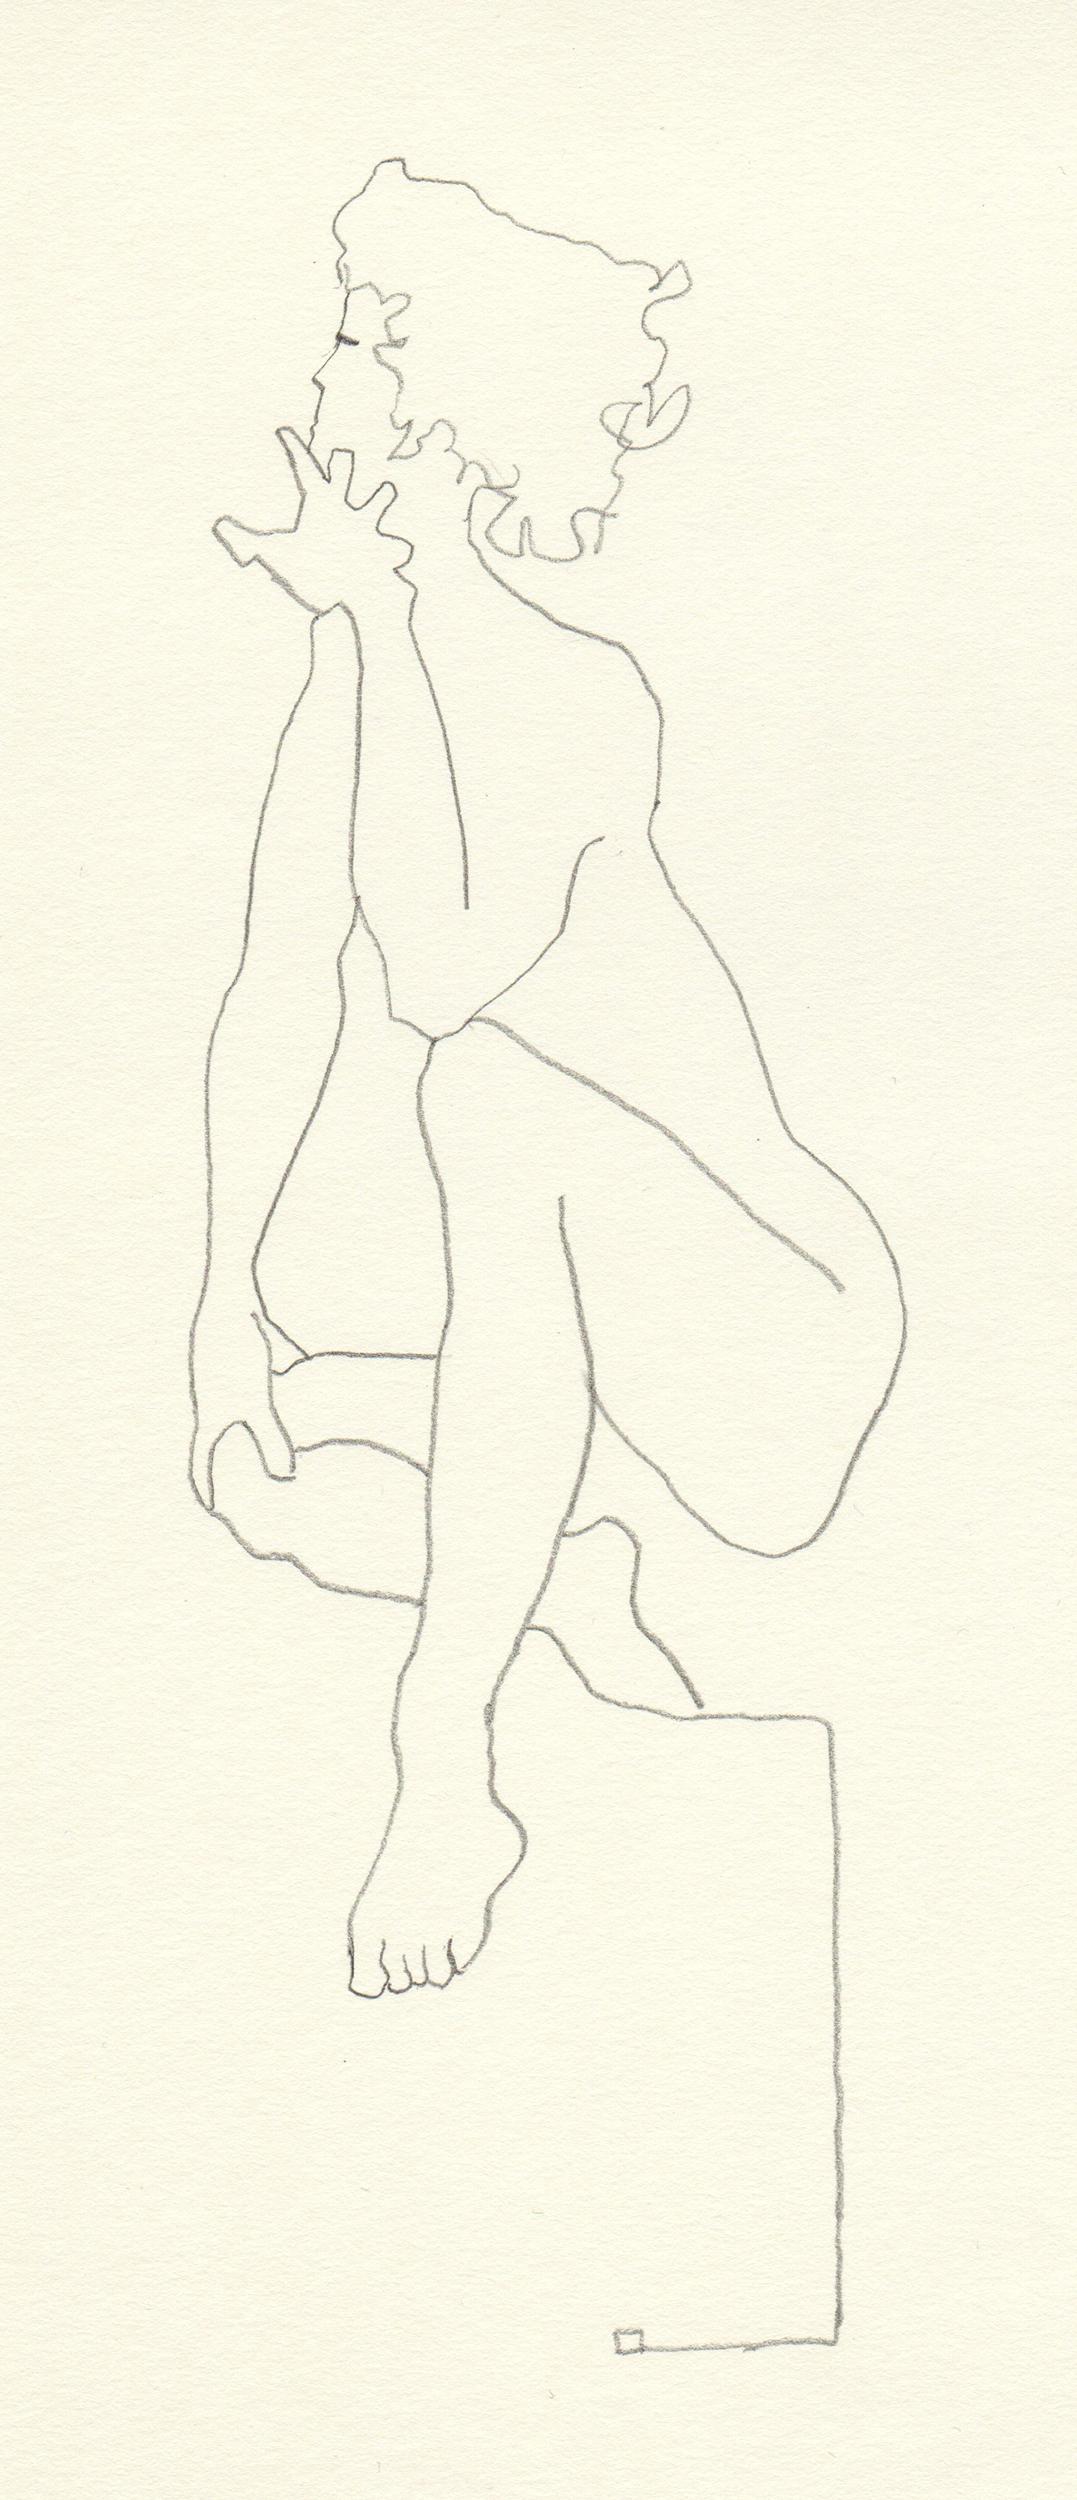 2012_Sketch_F-Beudin_040